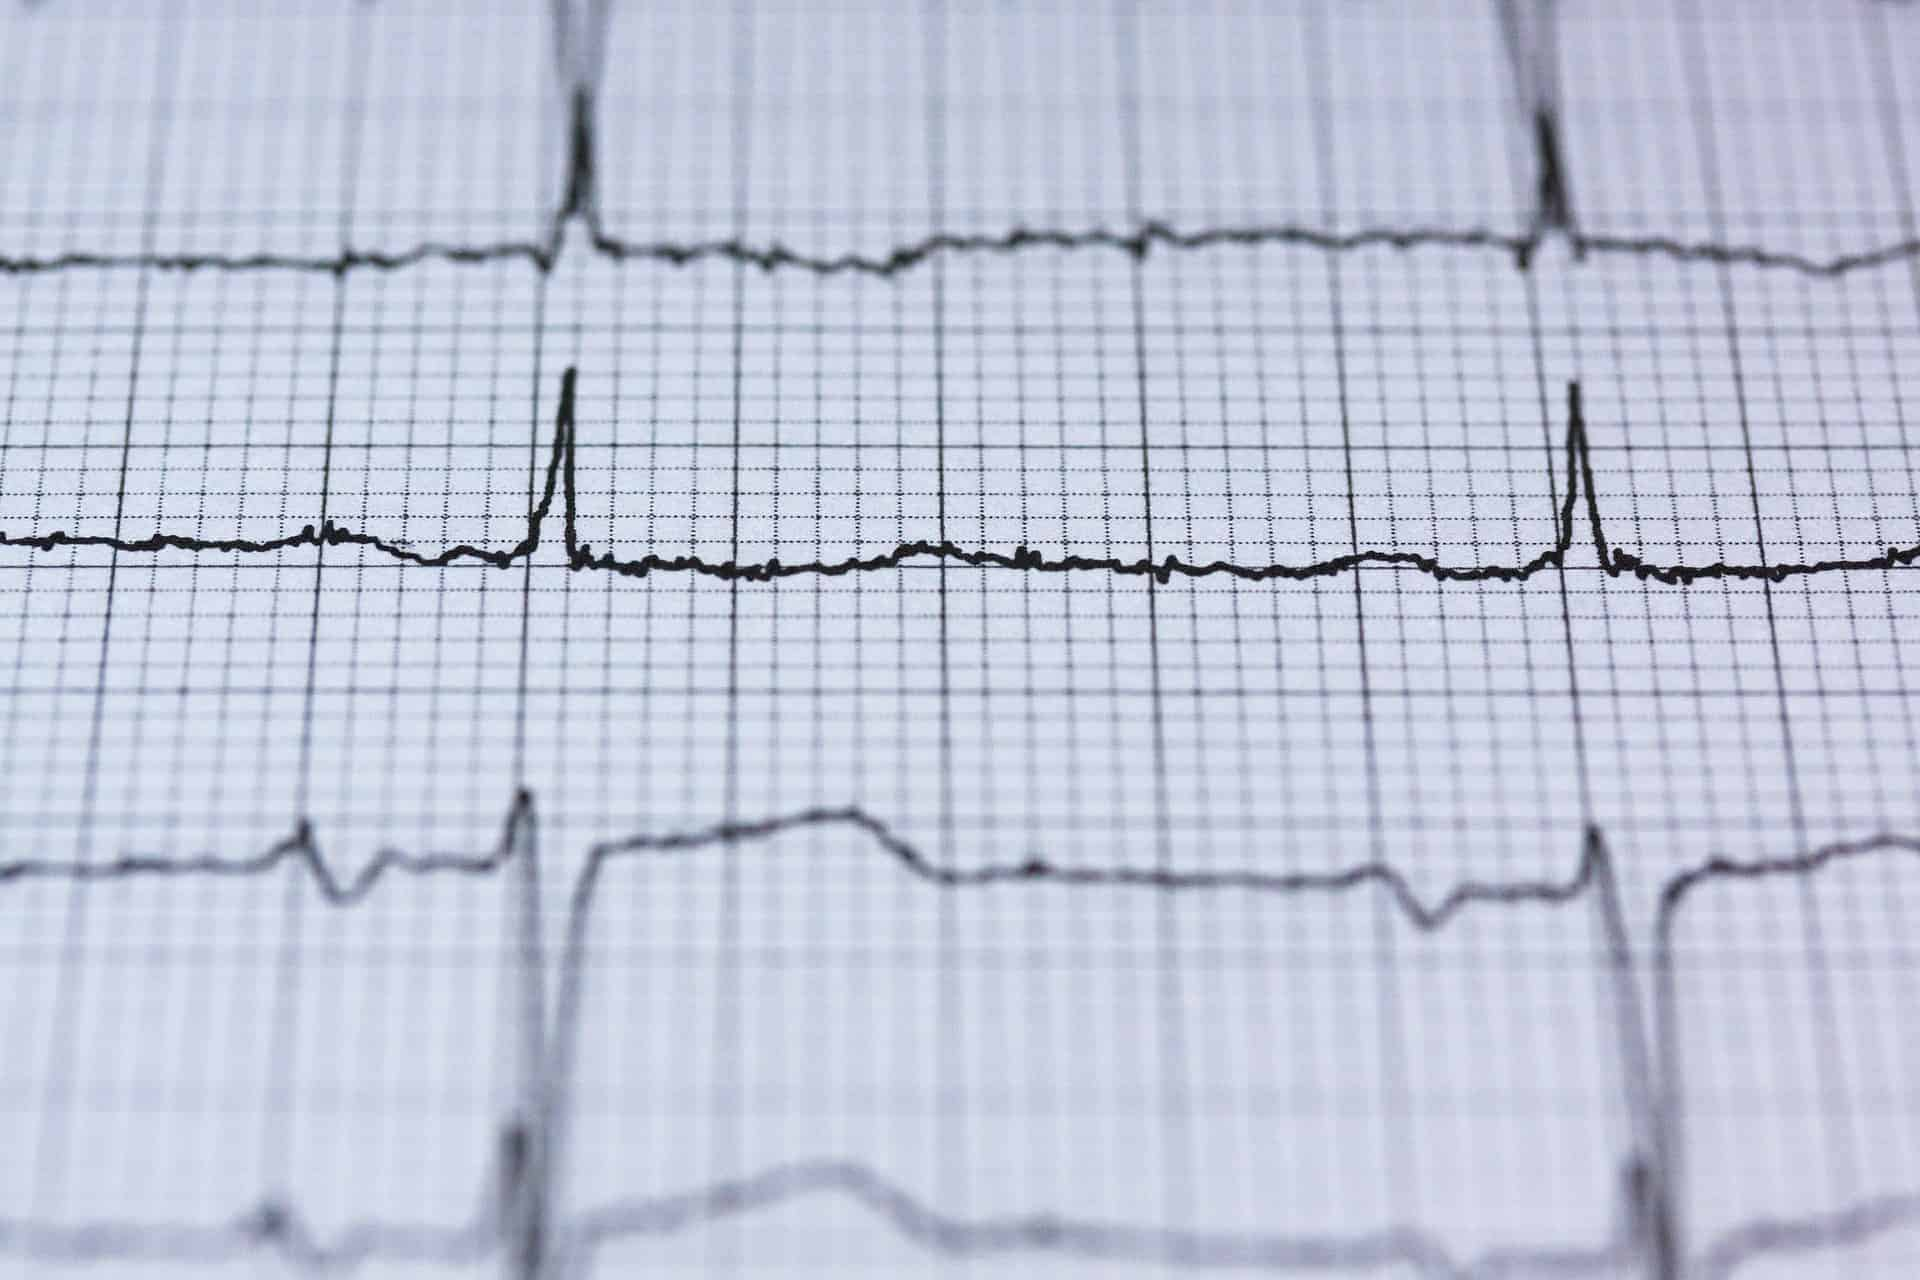 Echocardiogram results